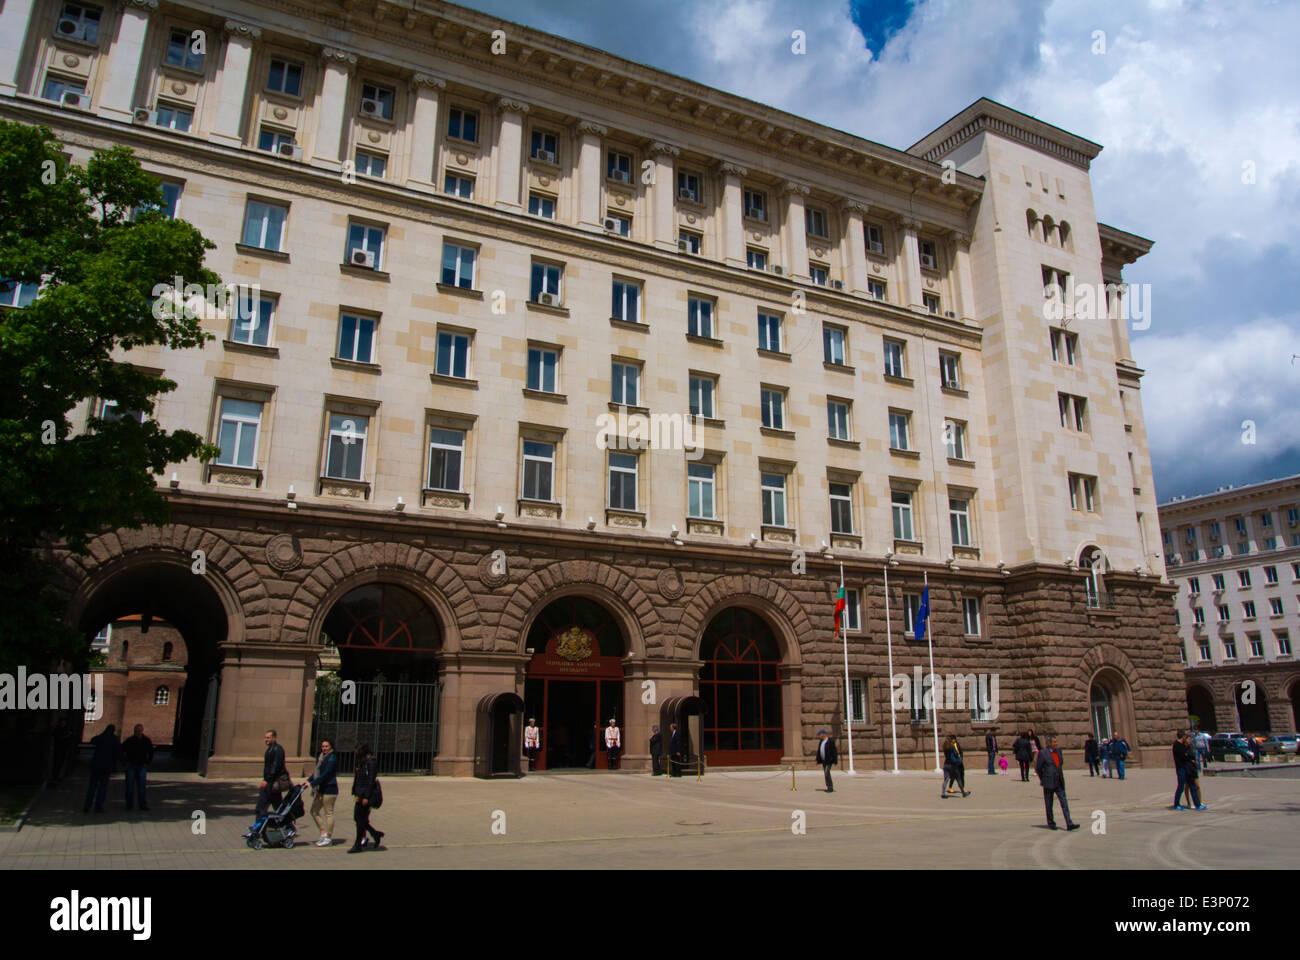 People walking outside Presidential palace, Atanas Burov square, central Sofia, Bulgaria, Europe Stock Photo